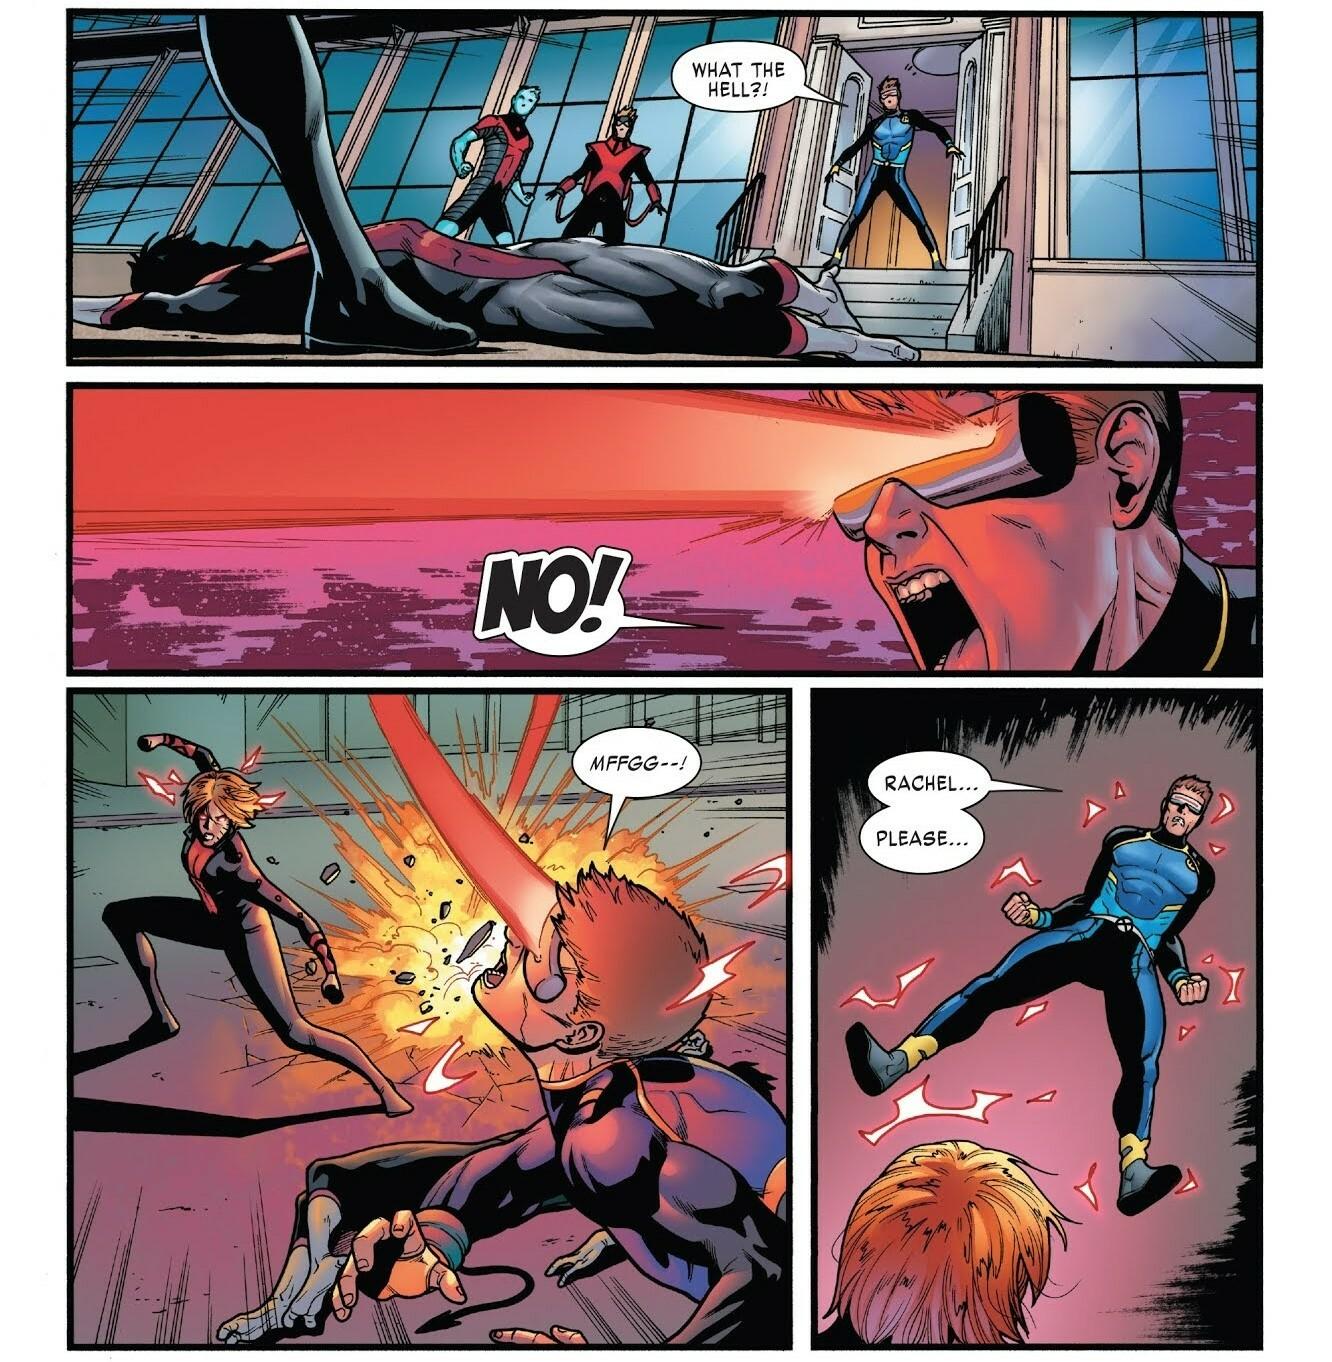 Redirect Teen Cyclops' Optic Blast and restrains him - X-Men Gold v2 #33